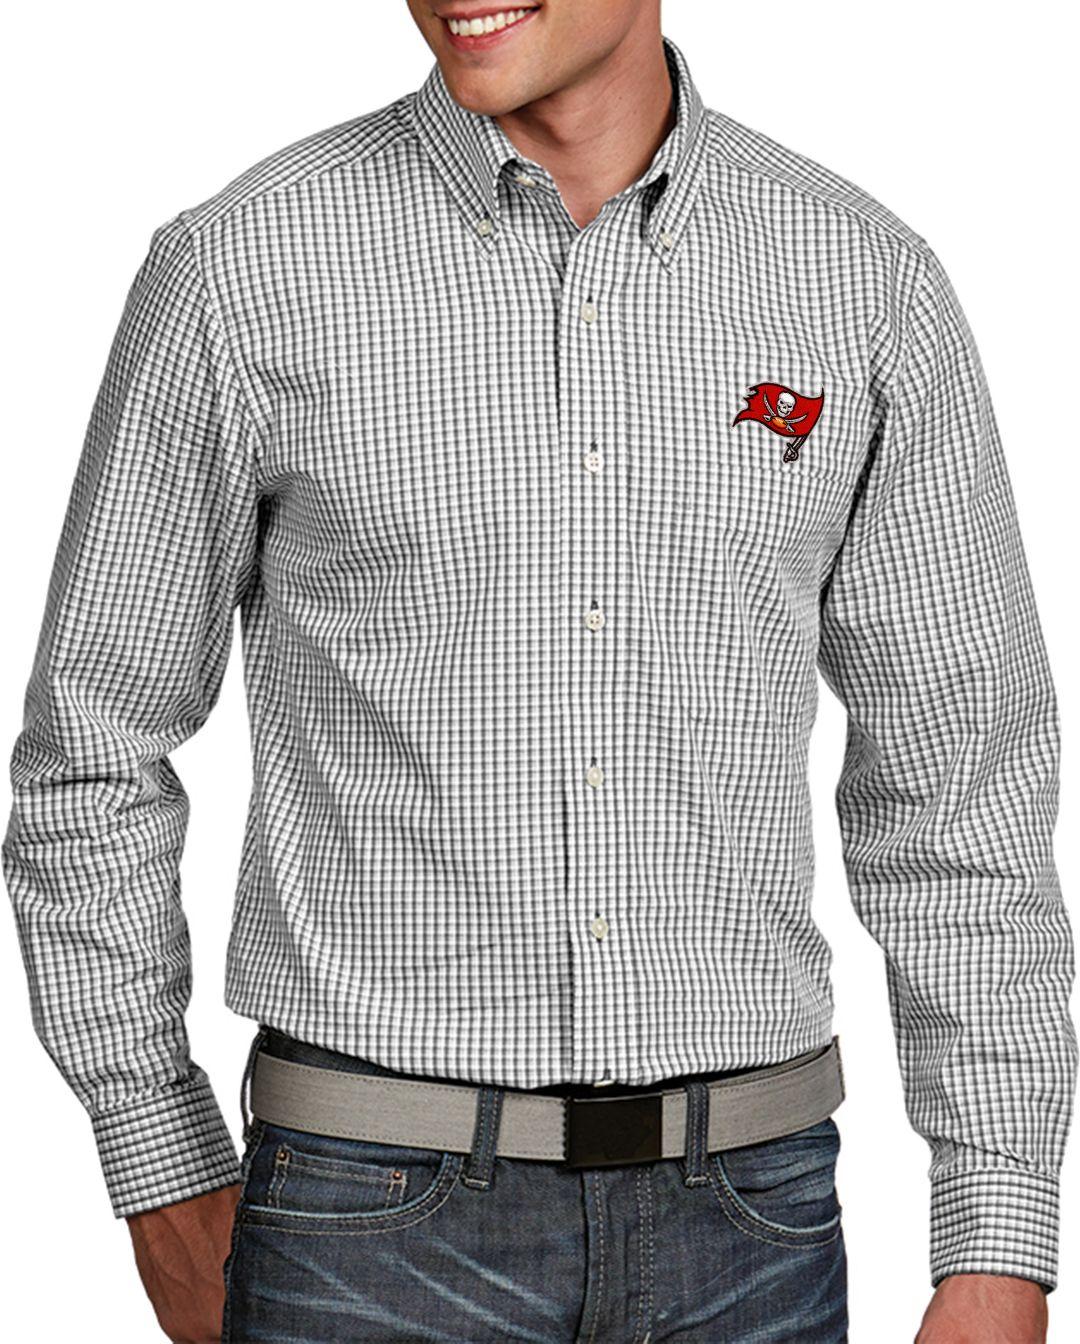 dbe5c223 Antigua Men's Tampa Bay Buccaneers Associate Button Down Dress Shirt